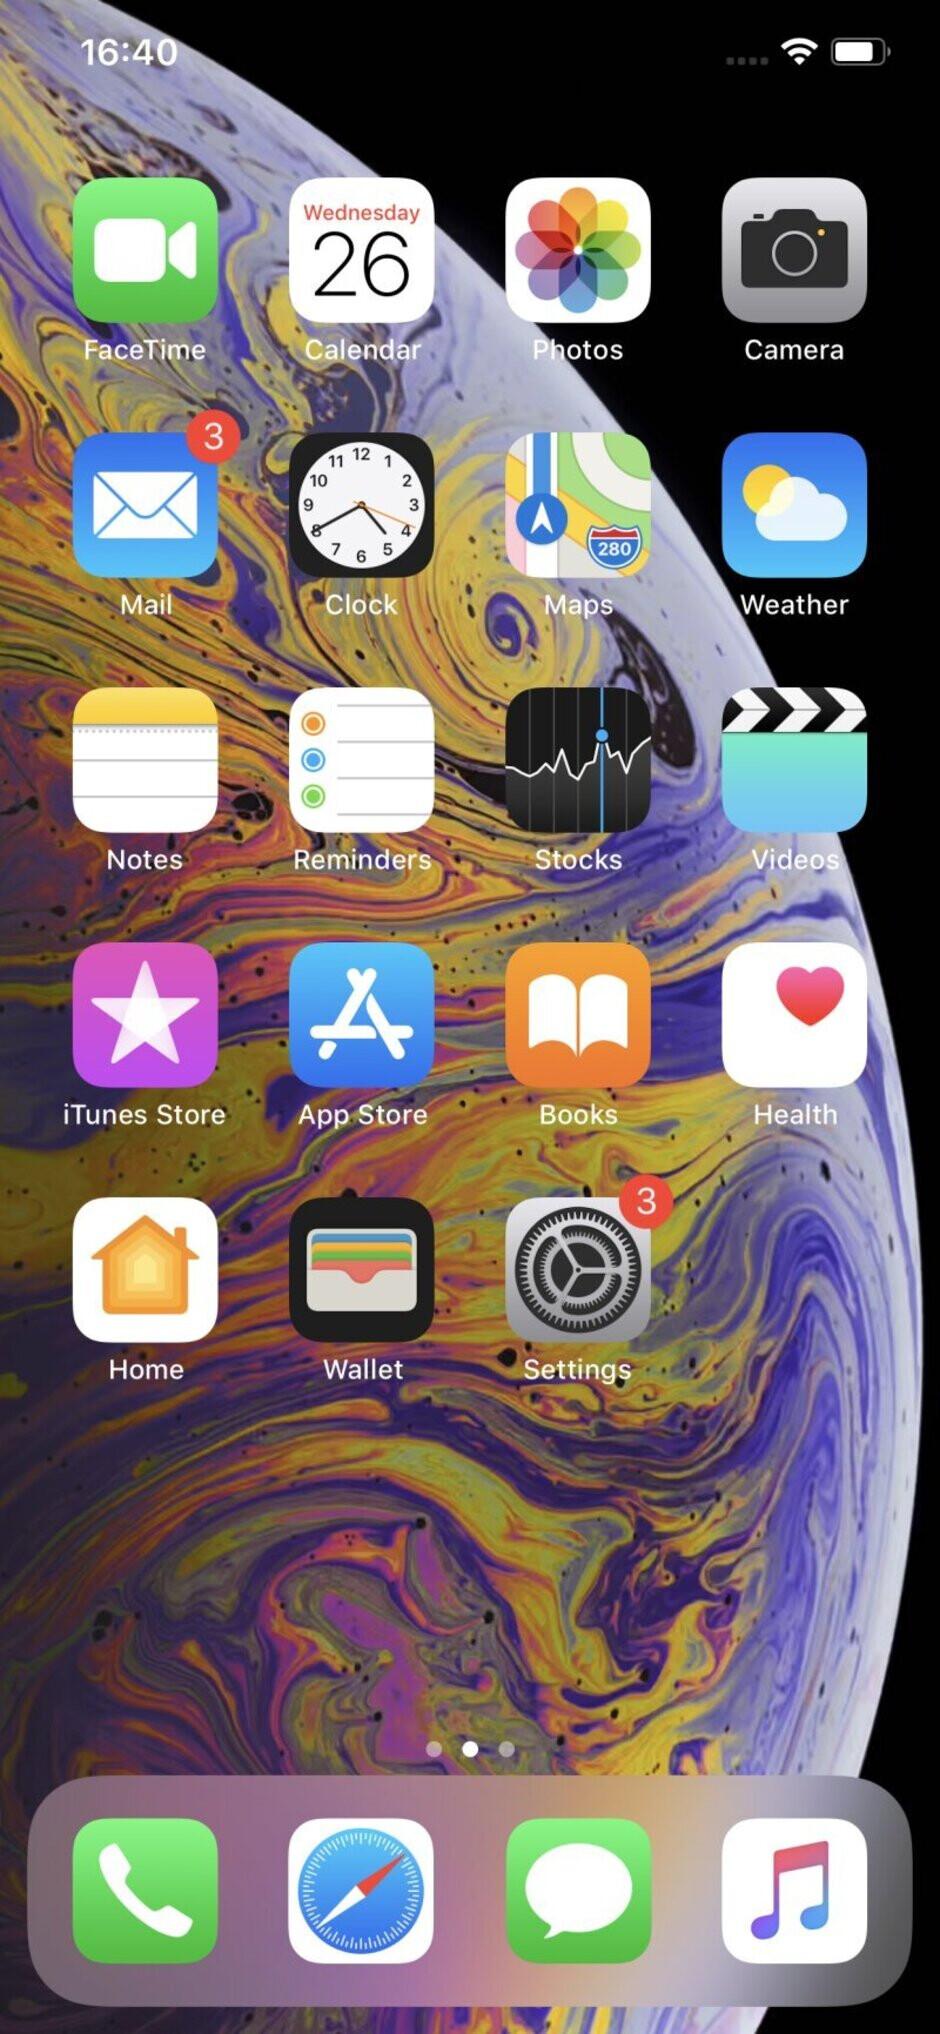 Apple's iOS 12 - Apple iPhone XS Max vs Huawei P30 Pro